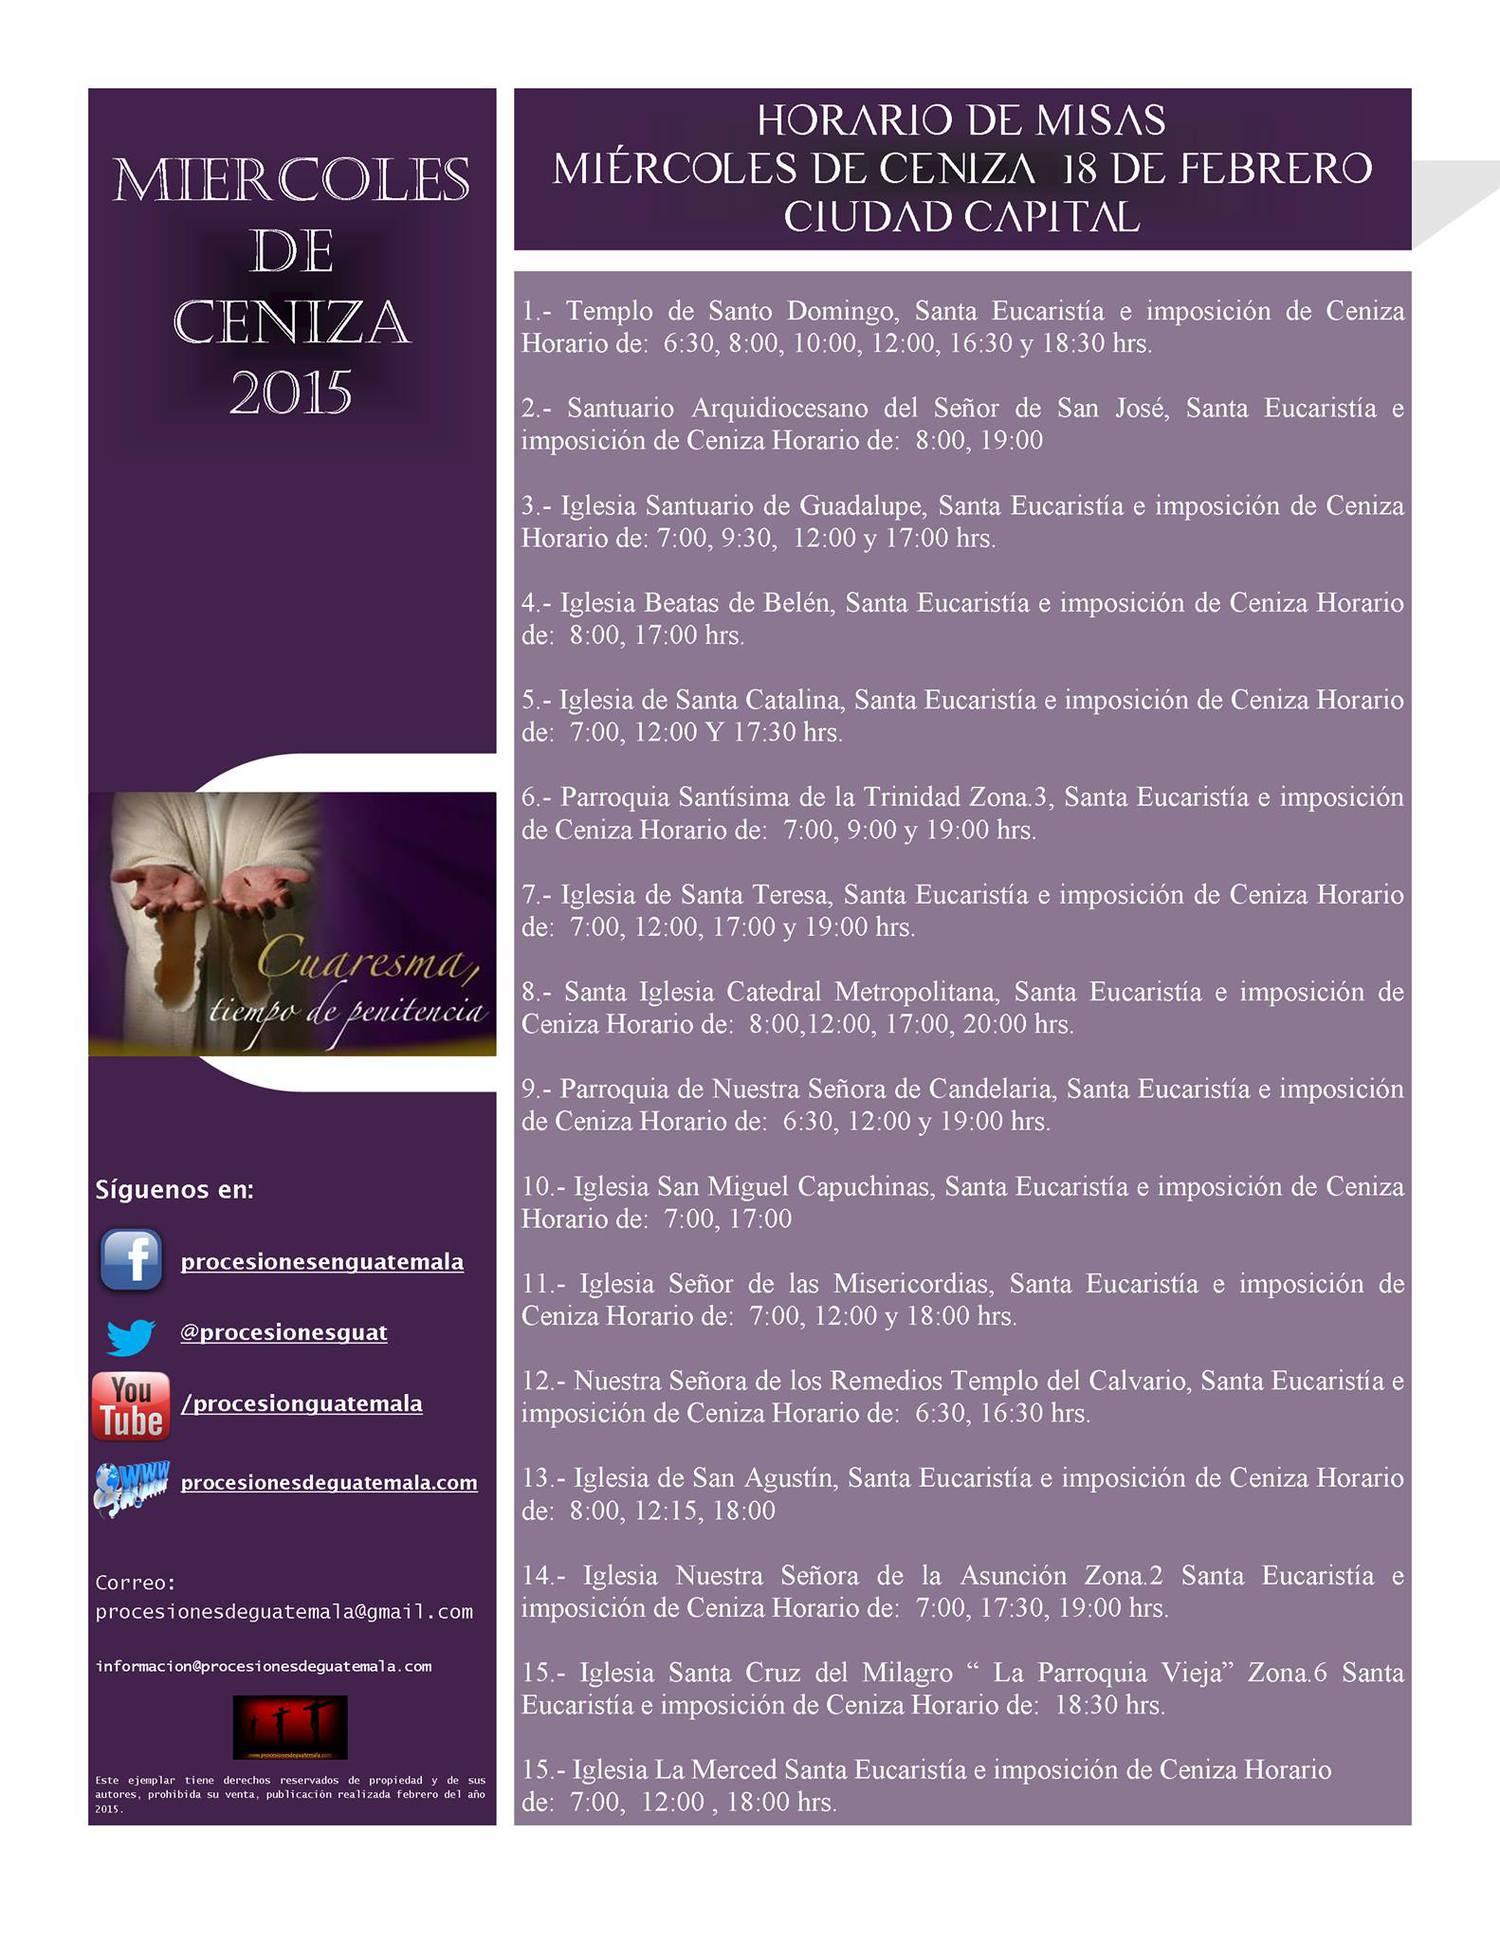 horario de misas madrid: